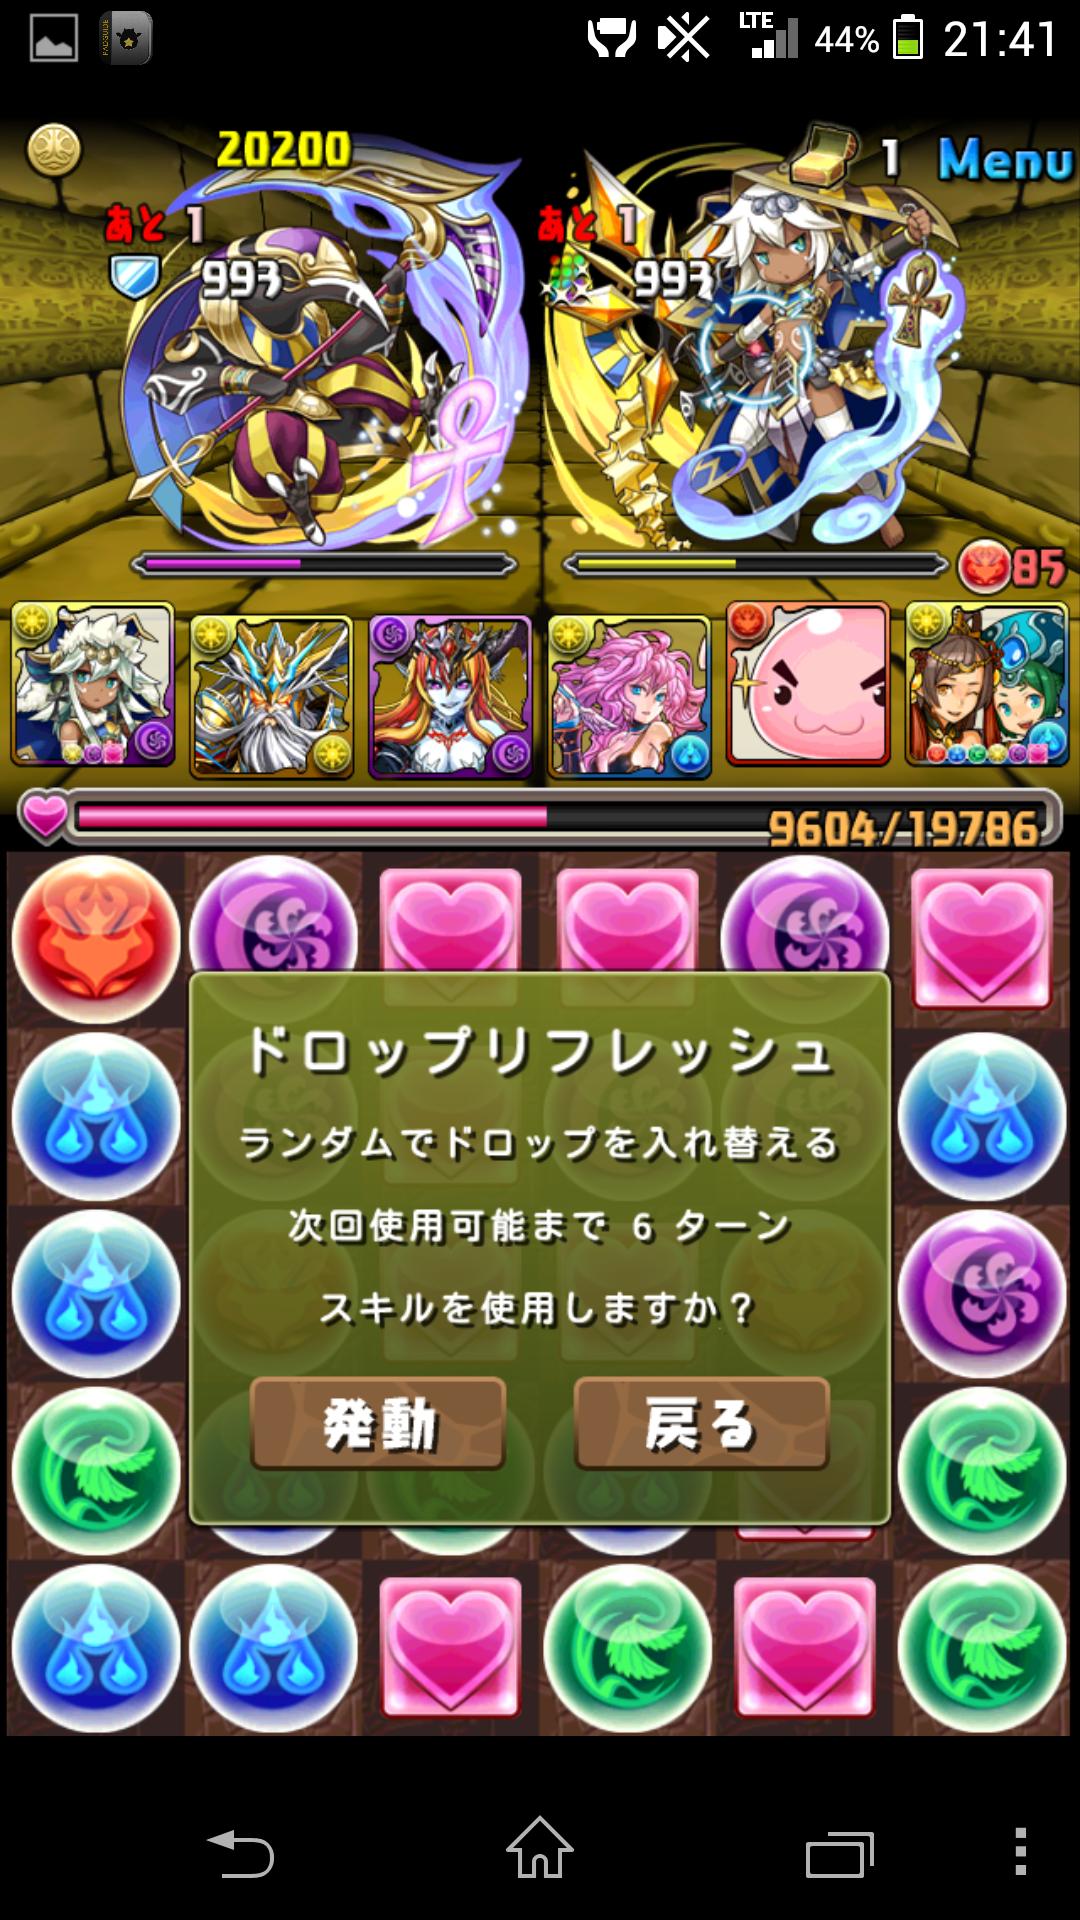 Screenshot_2014-07-16-21-41-04.png